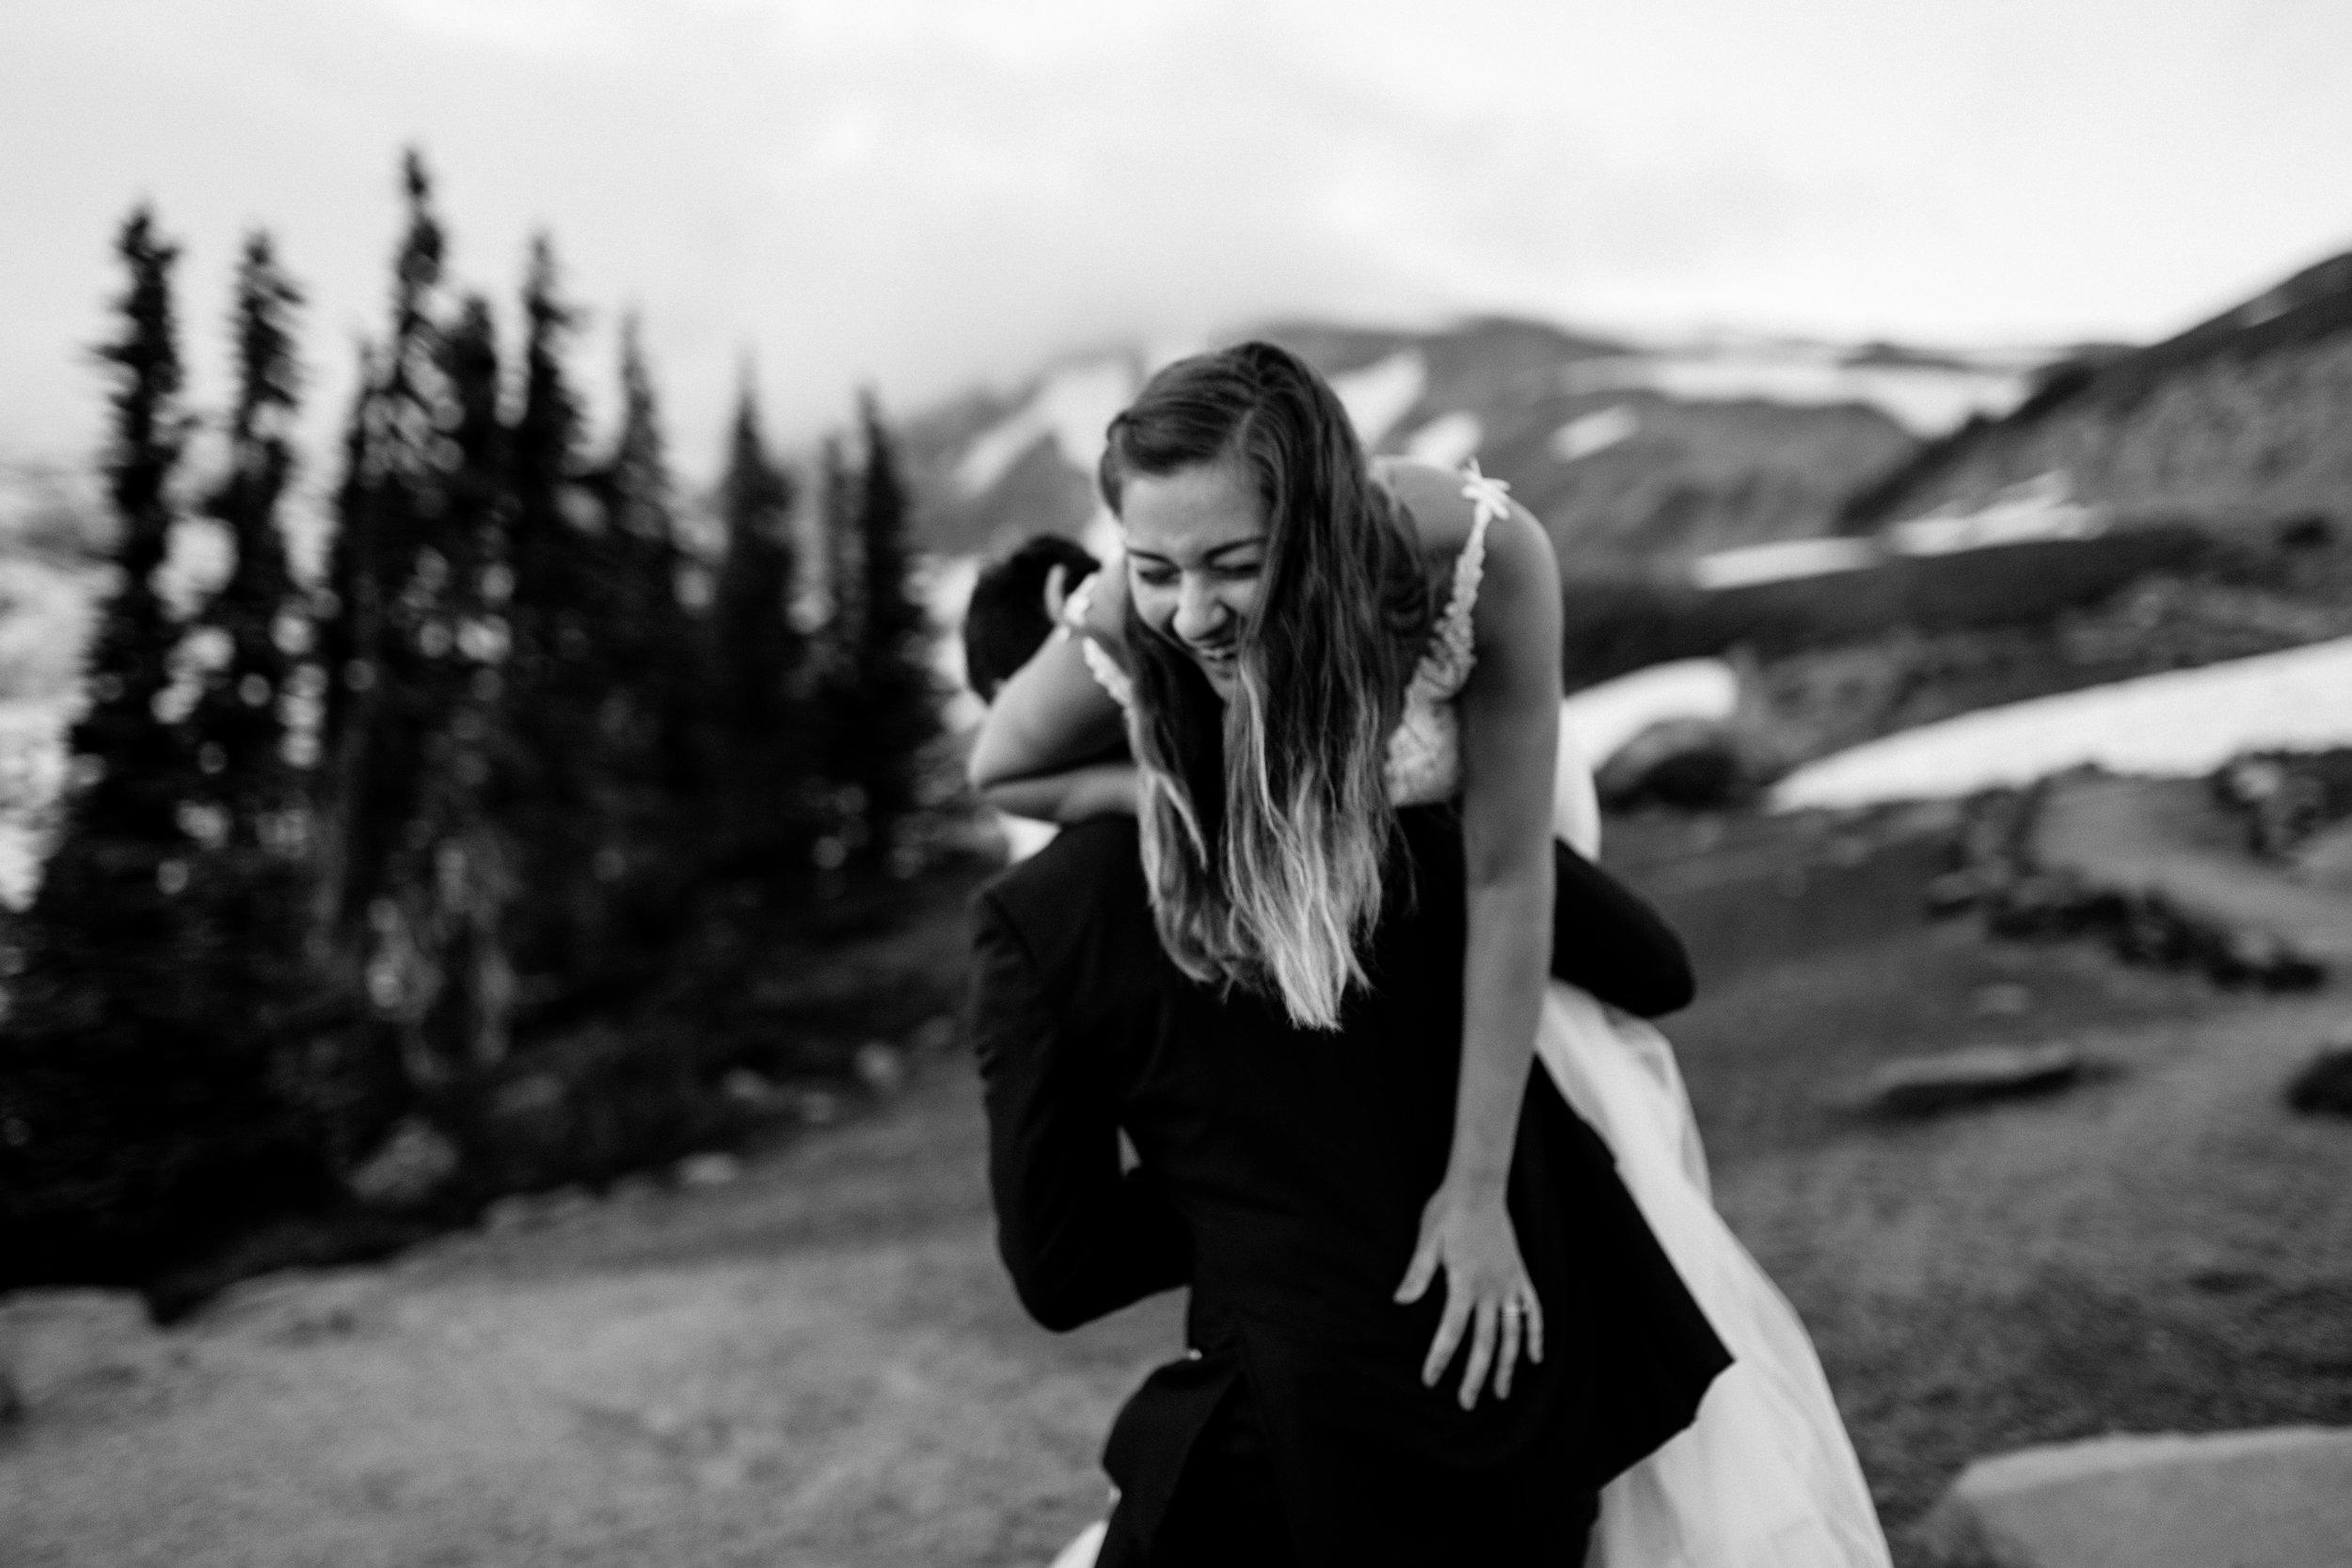 Nicole-Daacke-Photography-Mt-Rainier-elopement-photographer-washington-mountain-epic-wedding-photography-wildflowers-at-rainier-pine-tree-cloudy-summer-day-at-mountain-rainier-67.jpg